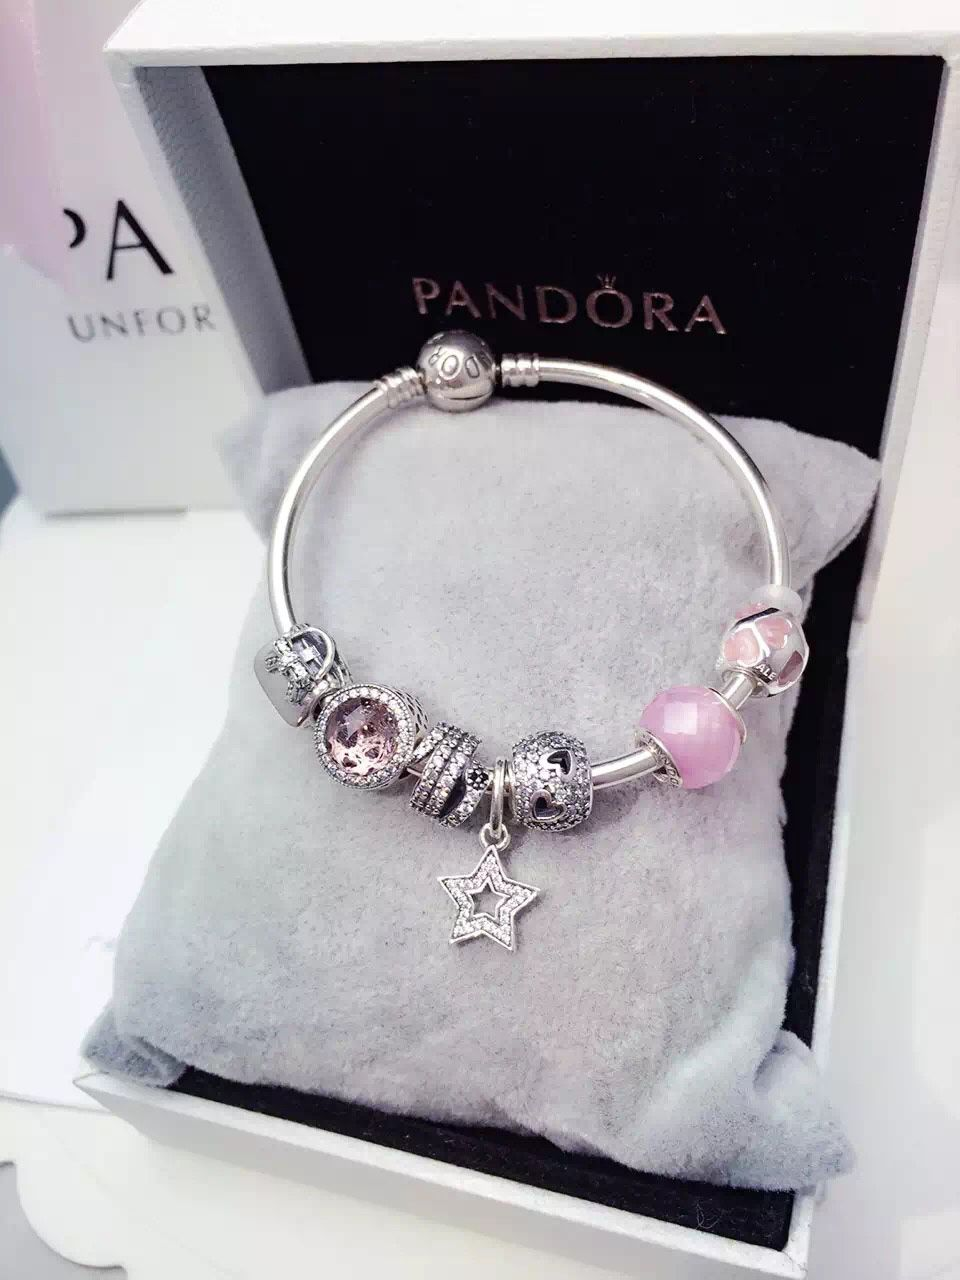 5257cf8a4 $199 Pandora Bangle Charm Bracelet Pink. Hot Sale!!! SKU: CB01808 - PANDORA  Bracelet Ideas